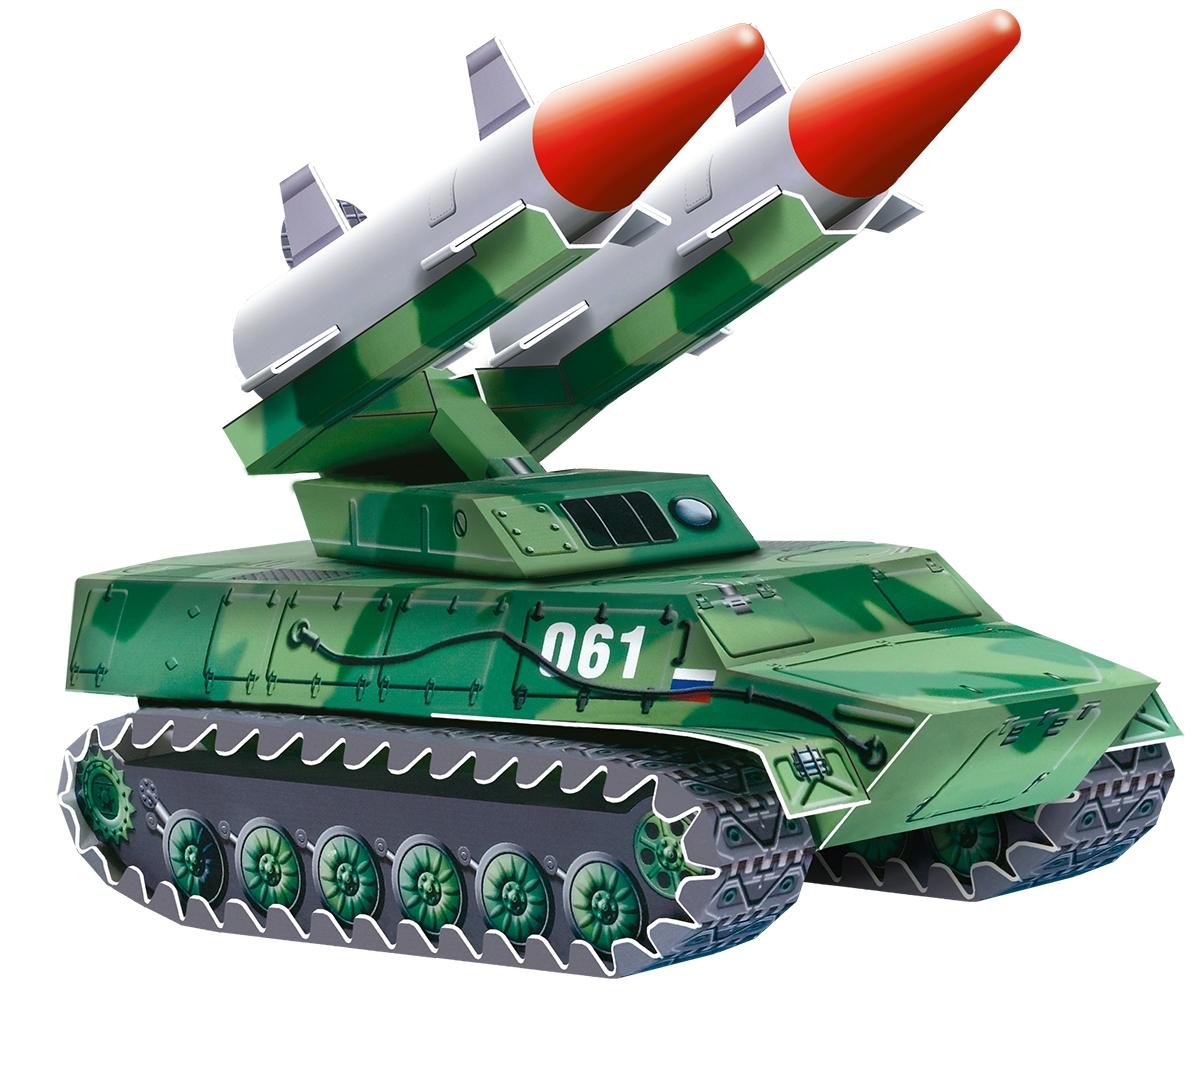 Умная бумага 3D Пазл Зенитно-ракетный комплекс